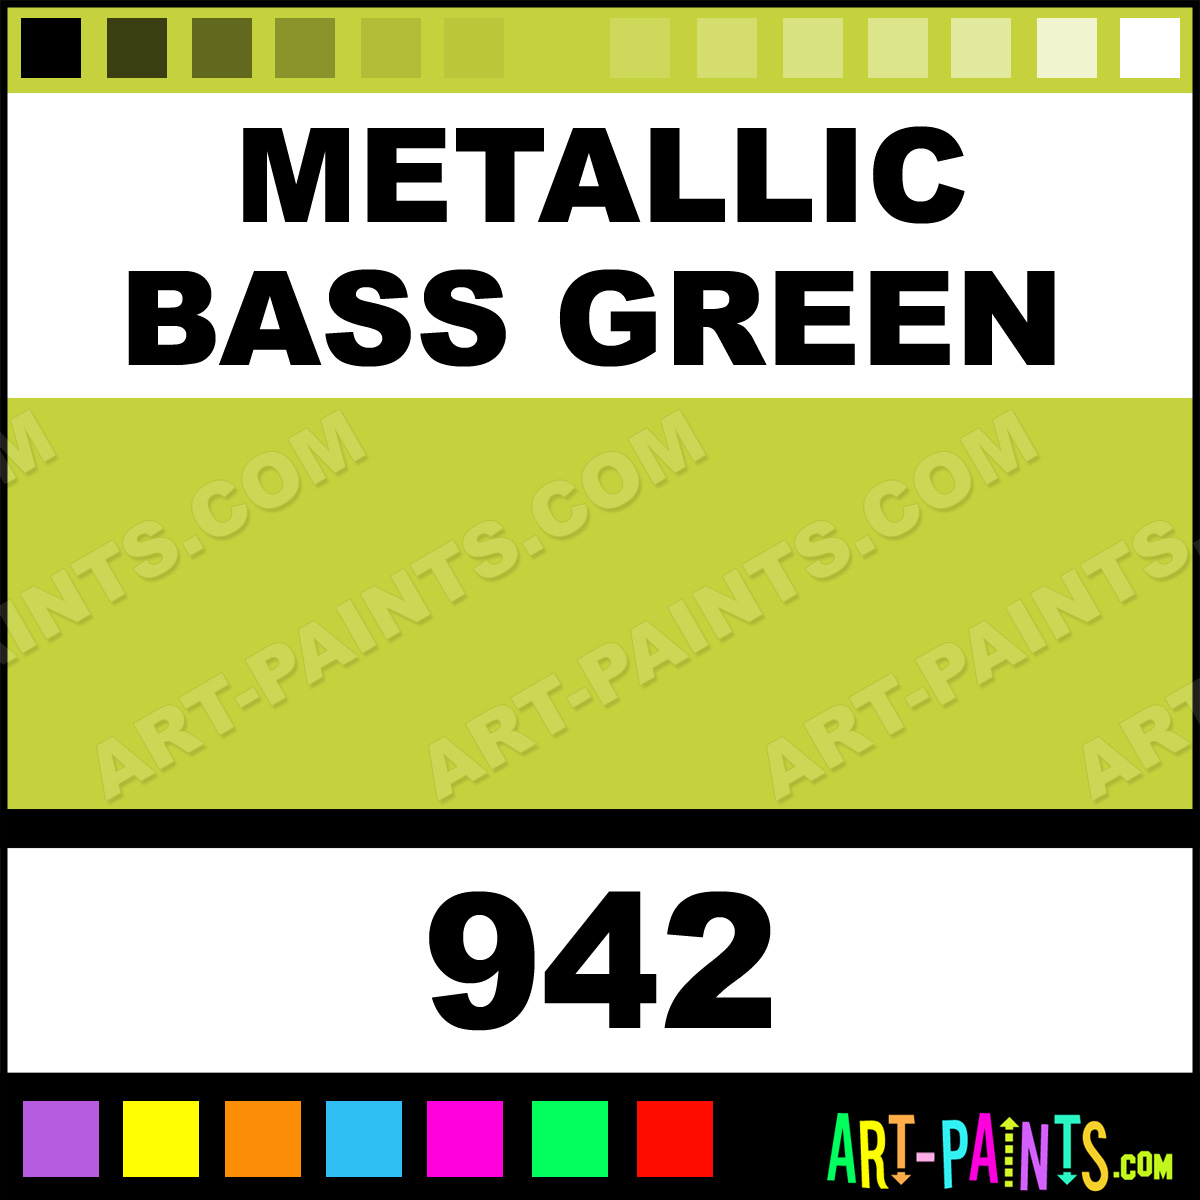 Metallic Bass Green Lacquer Airbrush Spray Paints - 942 - Metallic ...